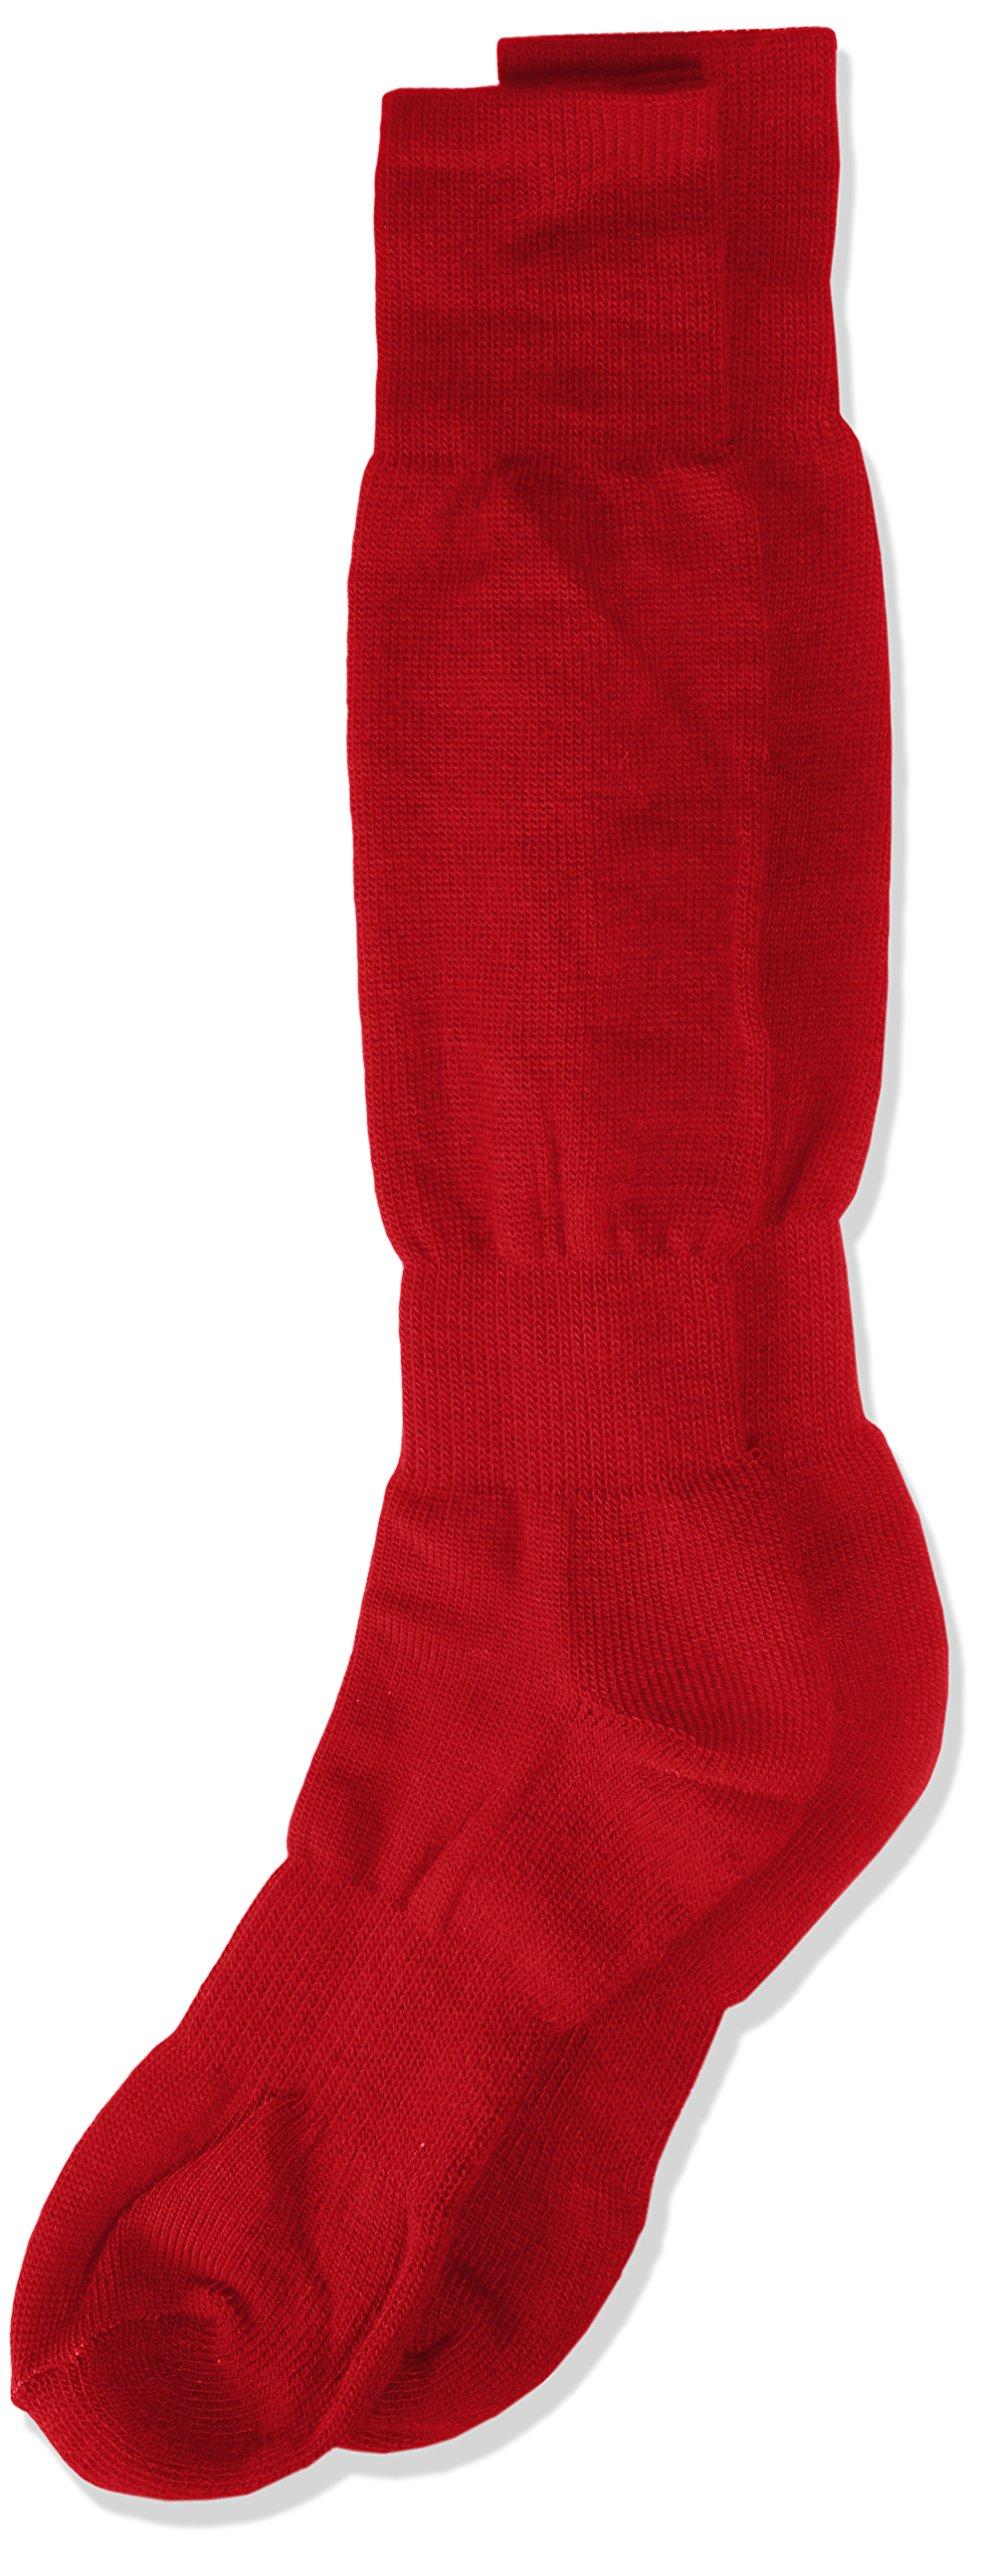 Varsity H/T Baseball Socks, Scarlet, Size 10-13 by TCK